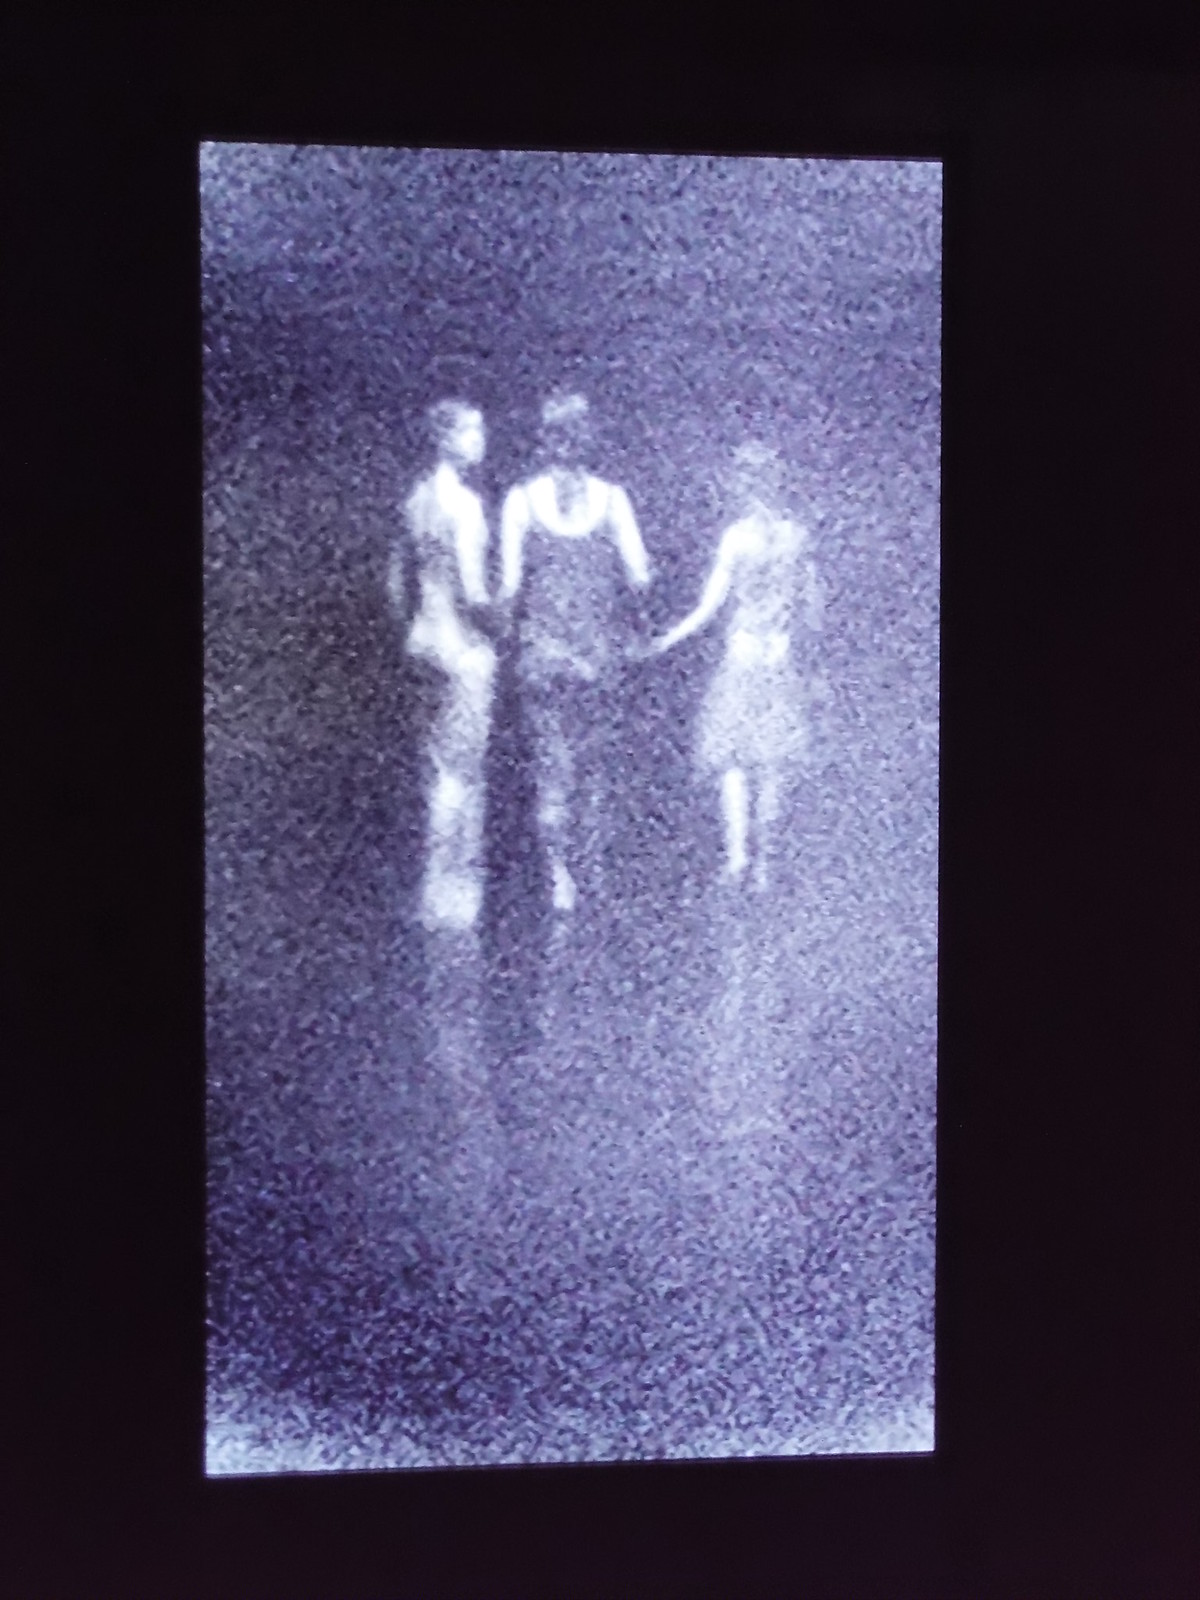 Still from: Bill Viola - Transfiguration Series SWC Short Walk 21 - The Line Modern Art Walk (Stratford to North Greenwich)